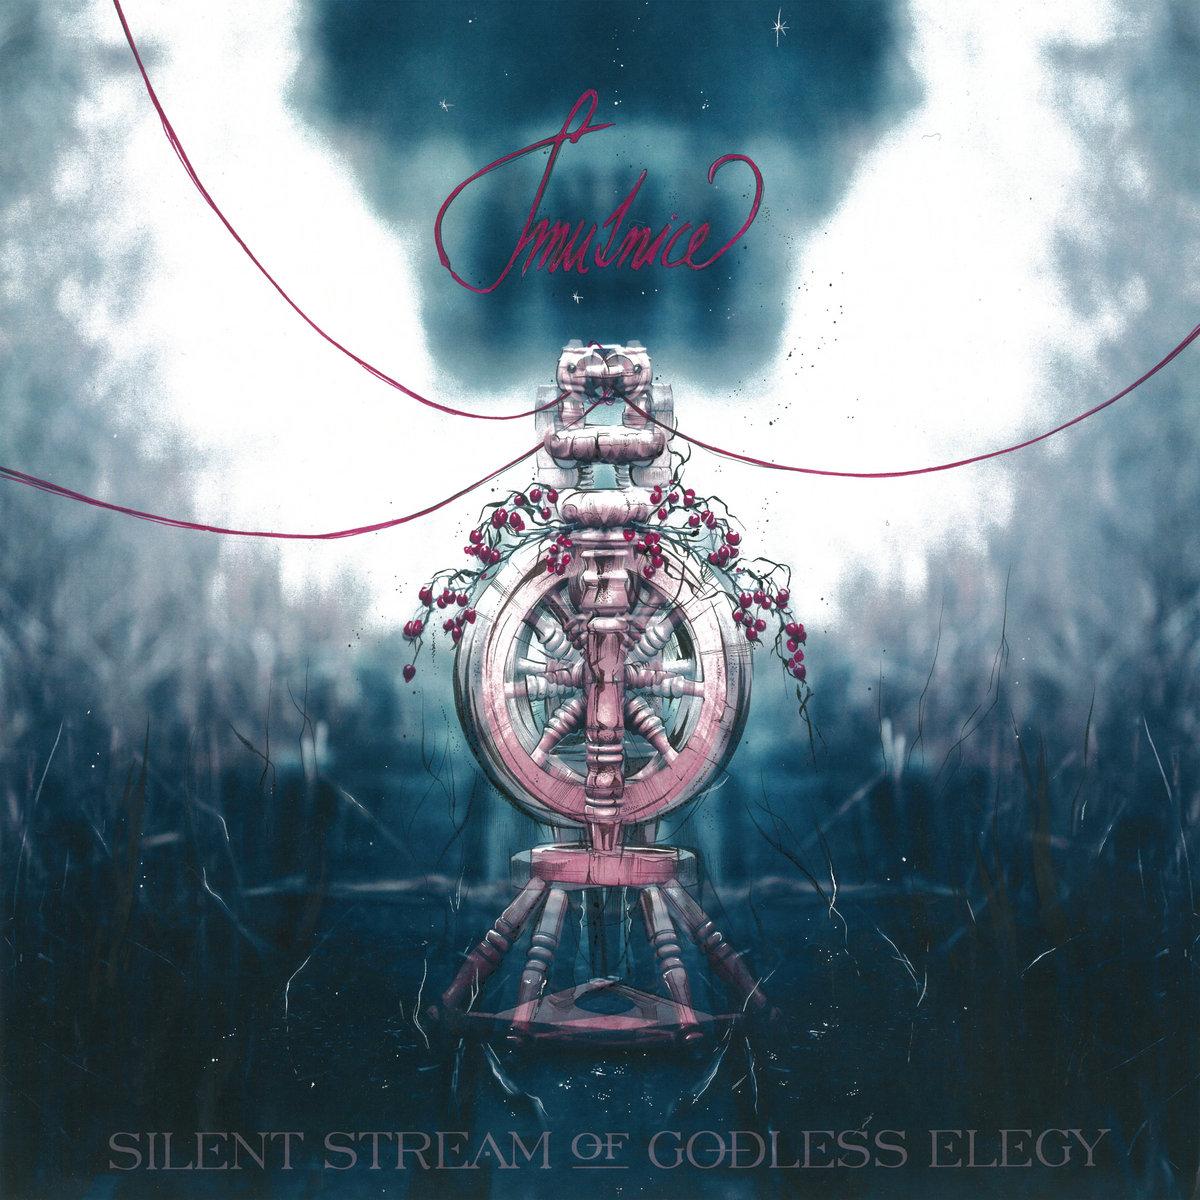 Silent Stream of Godless Elegy: Smutnice